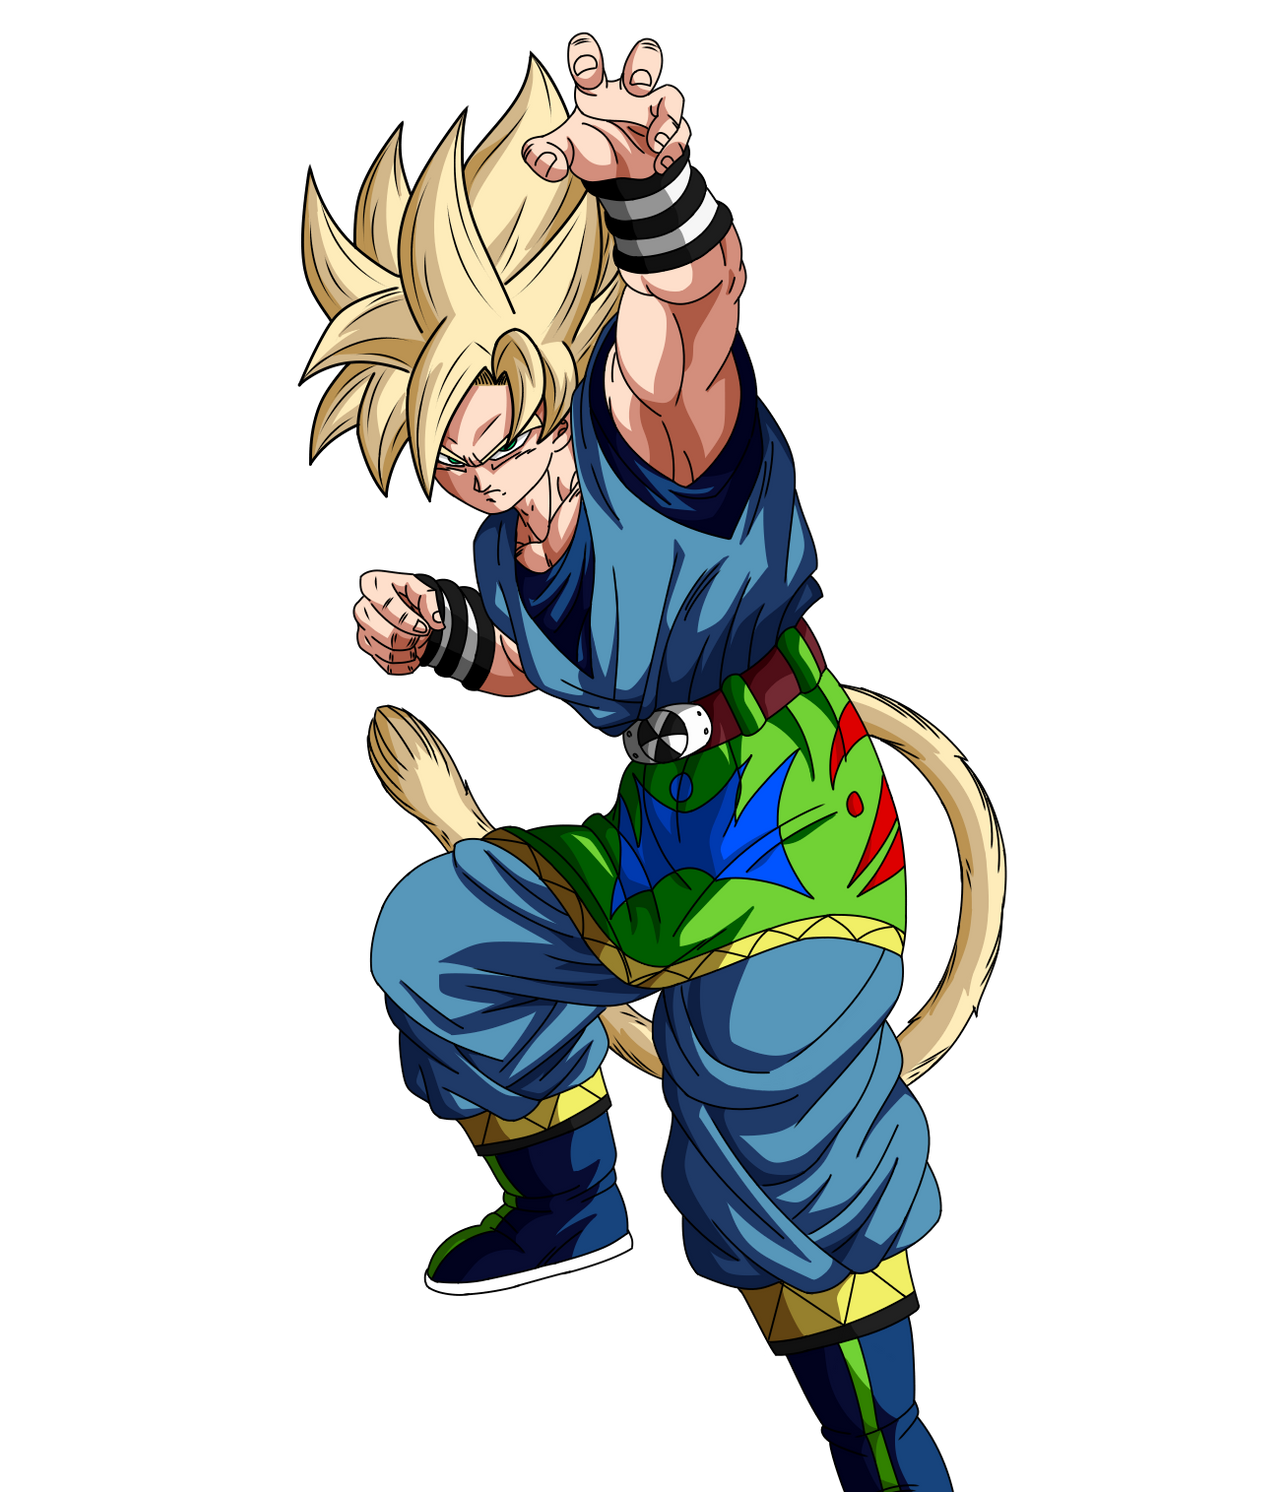 Goku Super Saiyan Pgv By Ivansalina On Deviantart Dragon Ball Goku Anime Dragon Ball Dragon Ball Artwork